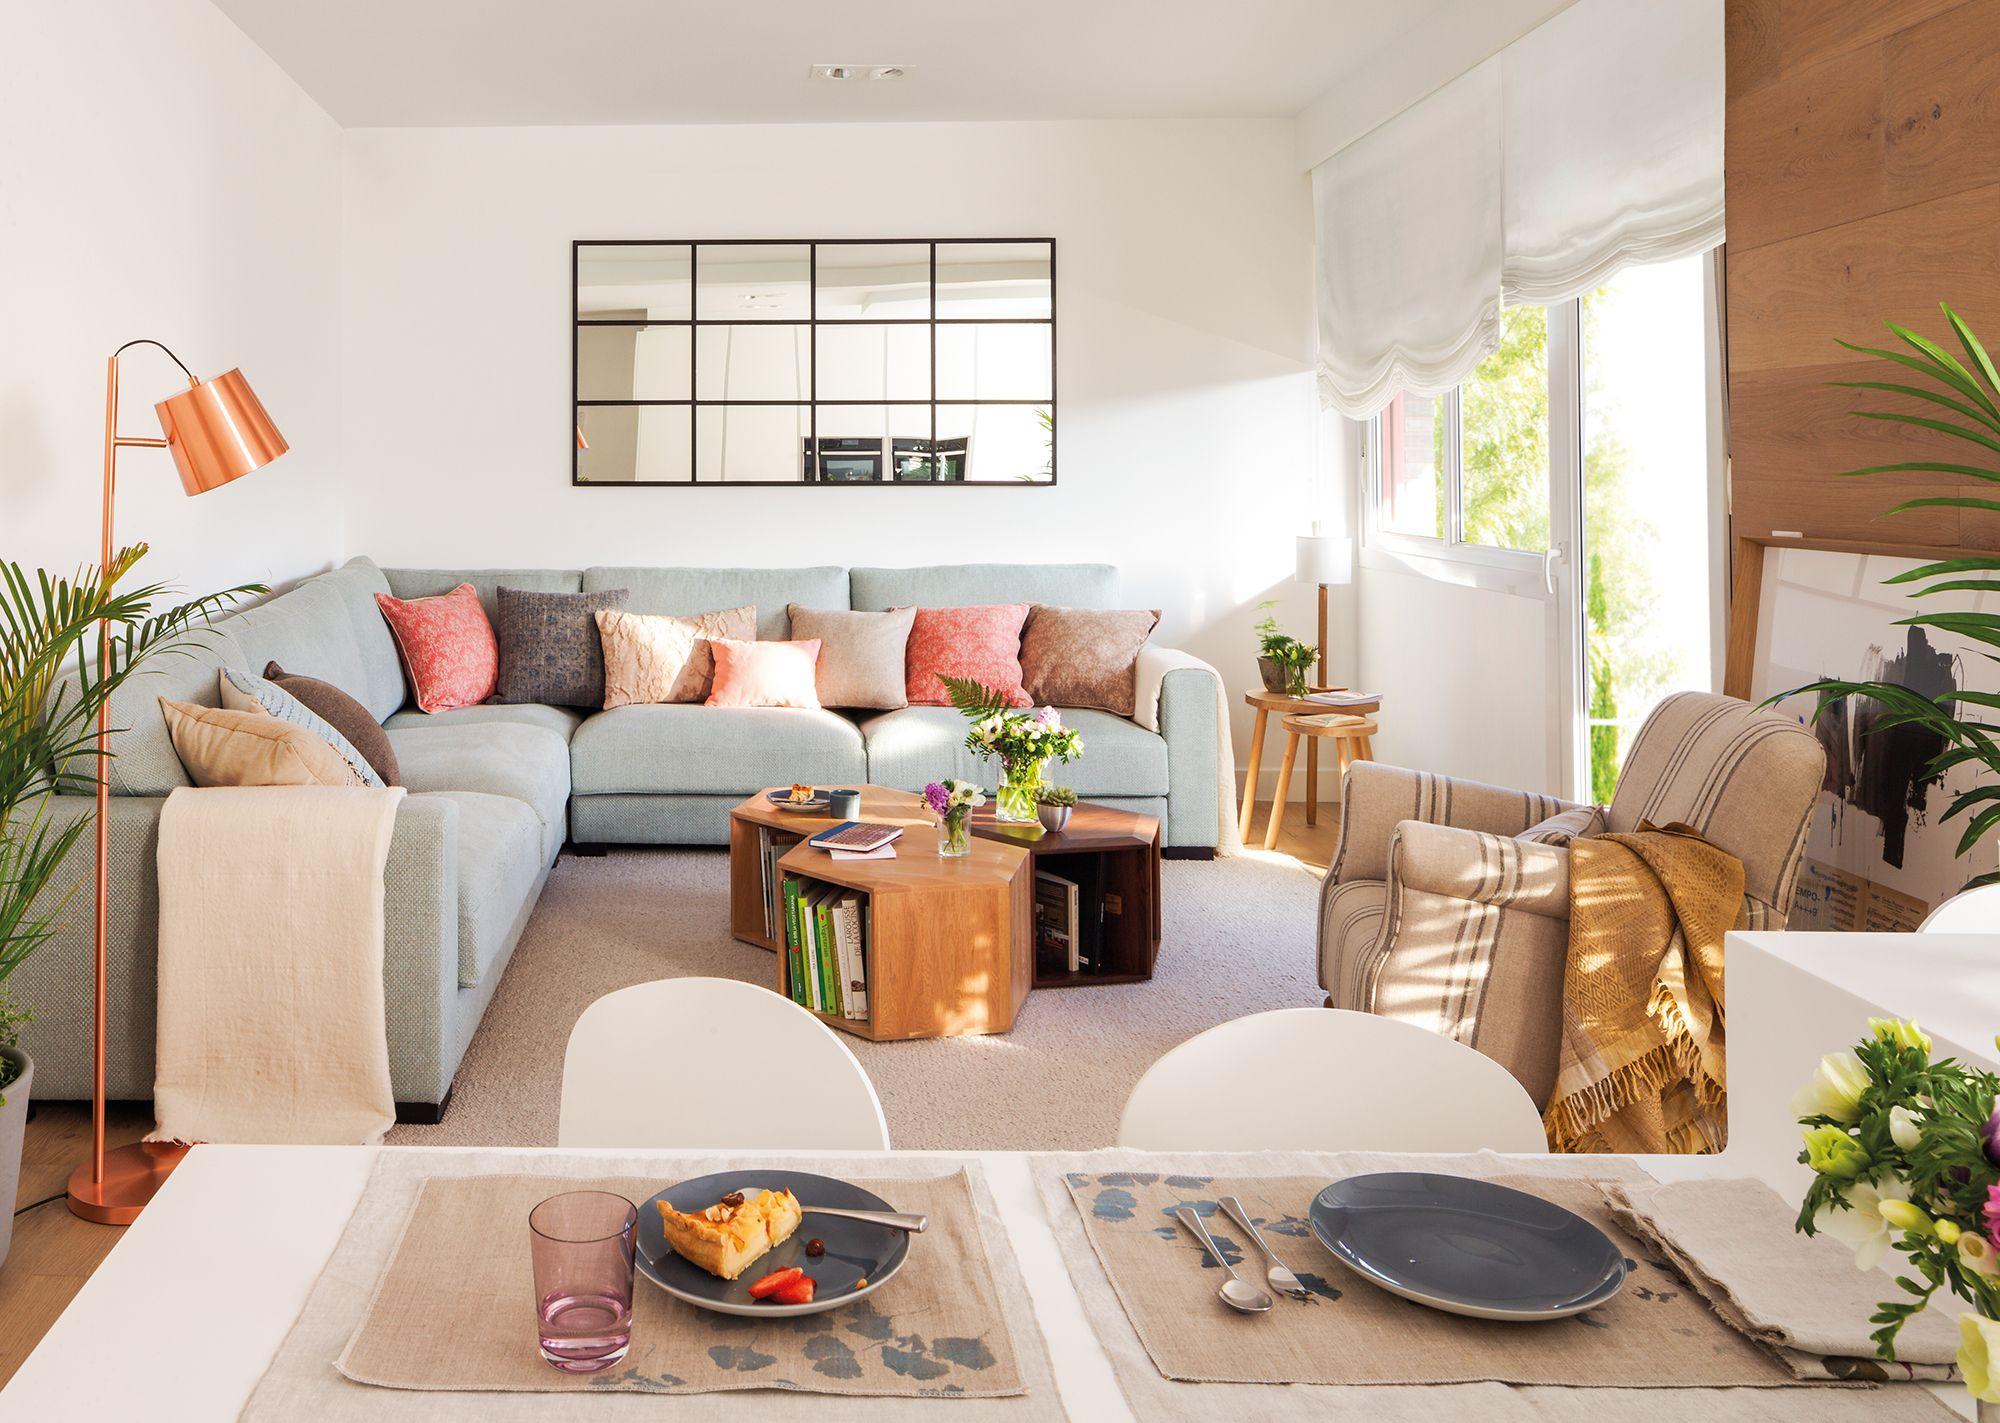 Abierto al comedor en 2019 casa sal n moderno sofa - Comedor salon moderno ...